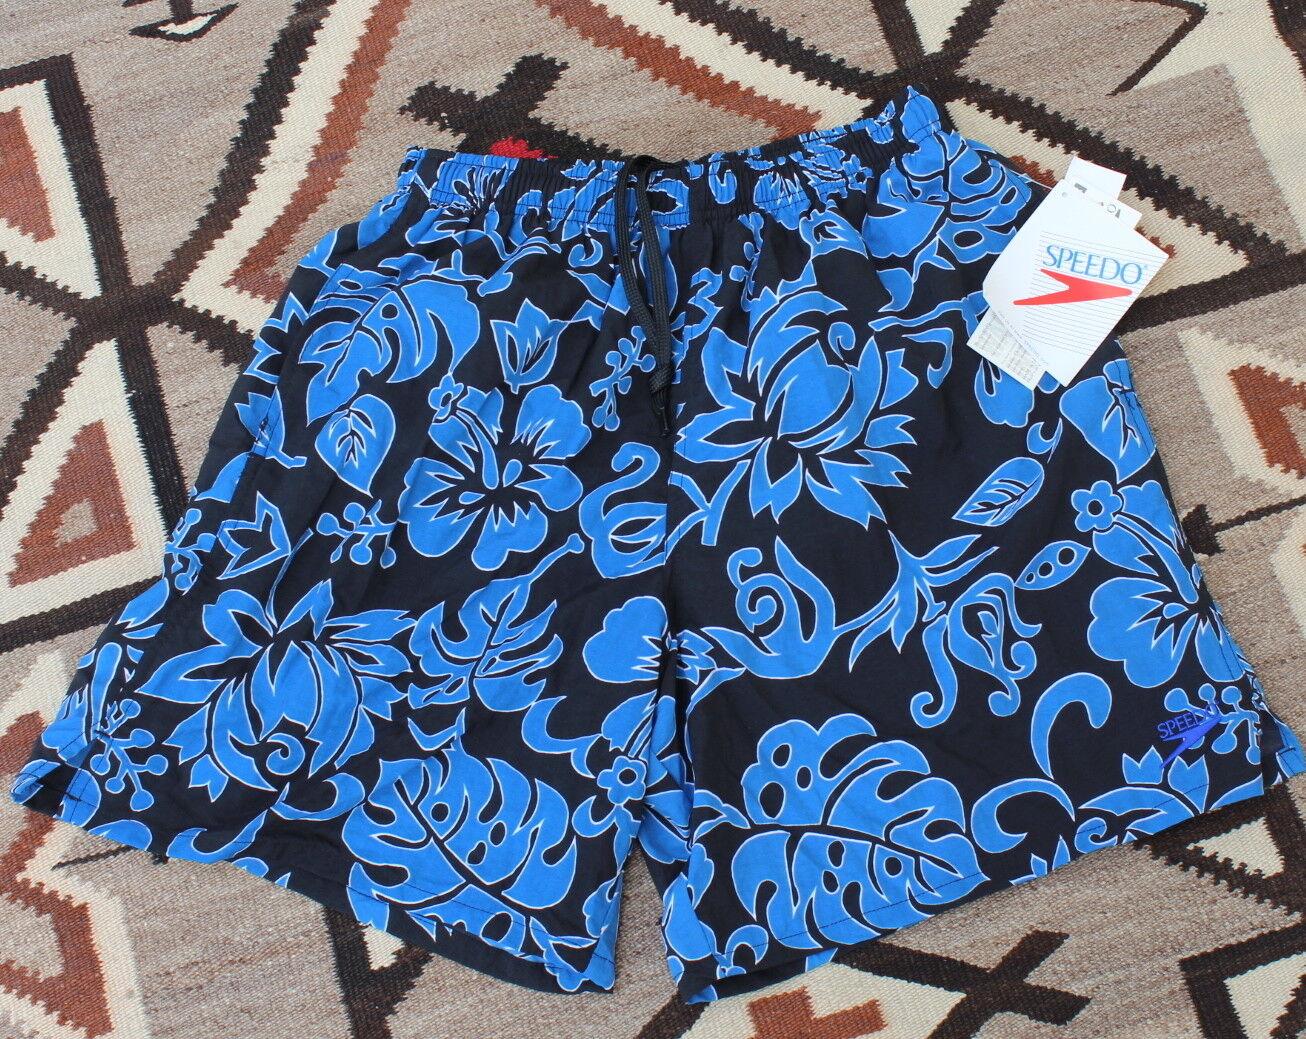 NEW Speedo -Sz M Vintage 1990s Floral Iconic Swim Trunks Shorts